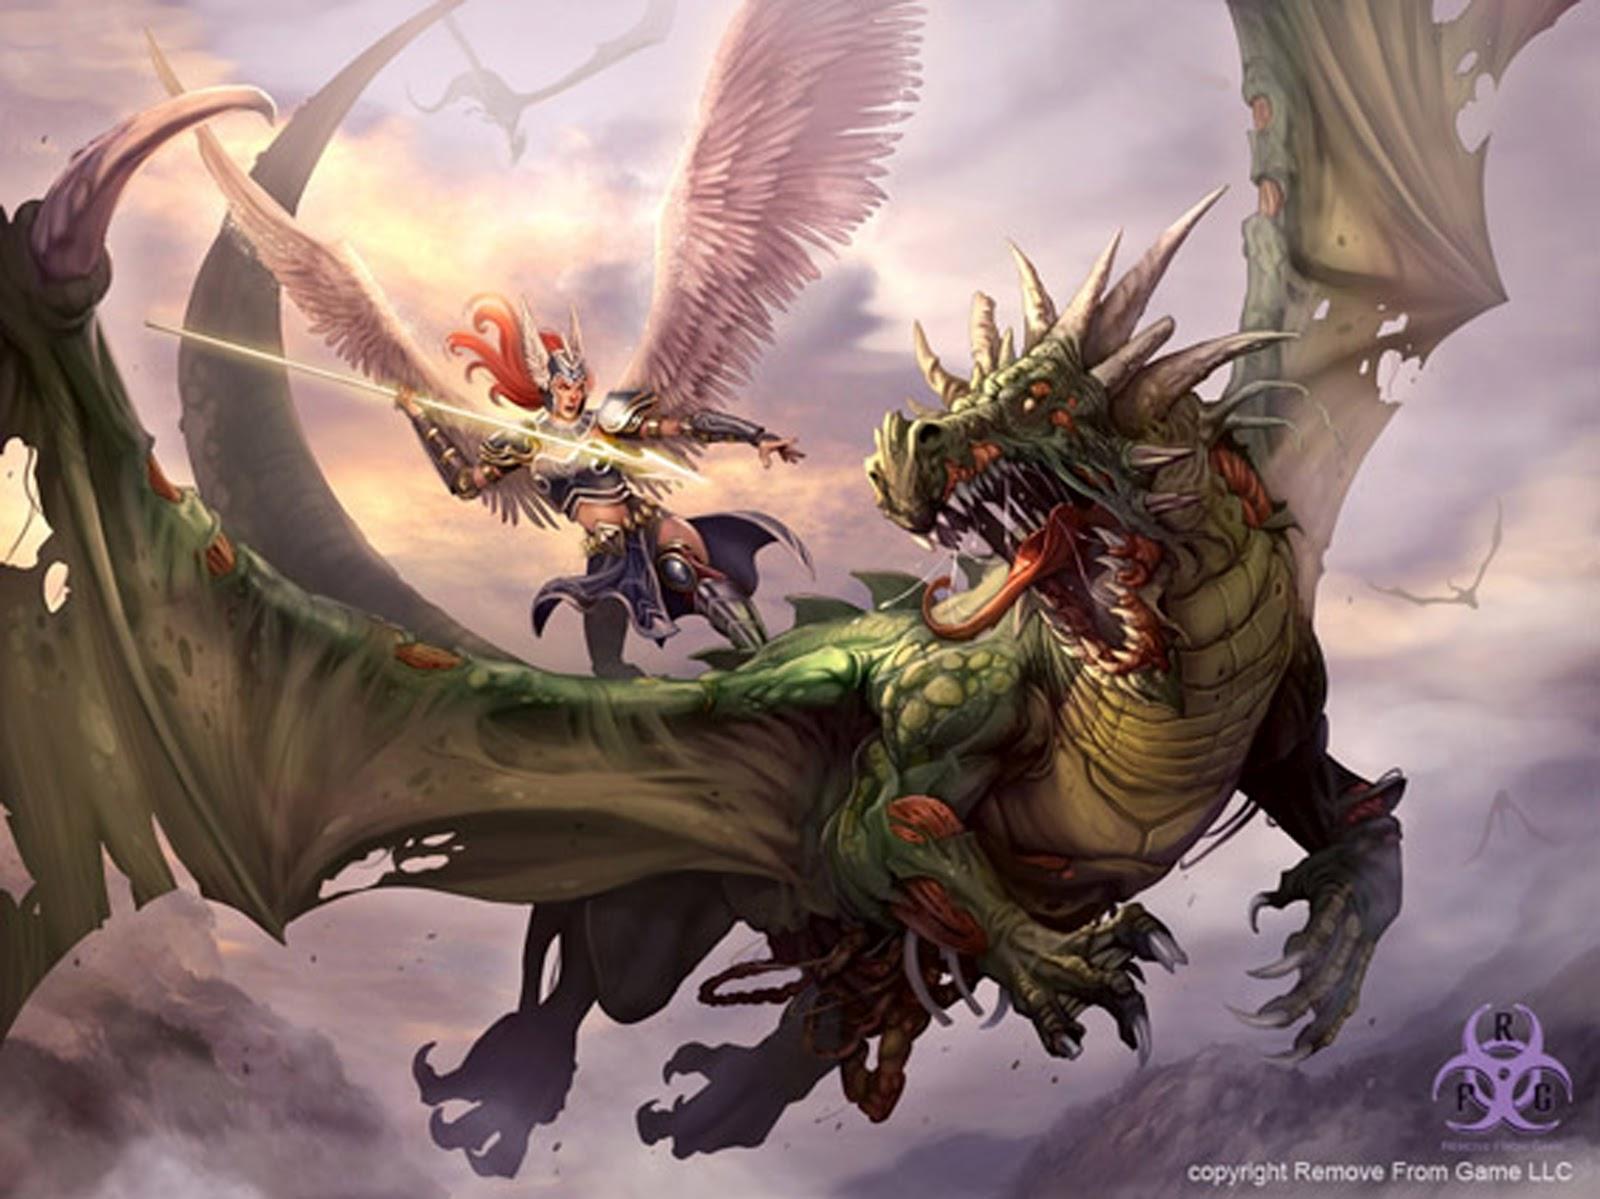 Fantasy+sci+fi+dragon+wing+serpentine+serpent+concept+art+design+angel vs dragon zombie by kikicianjur d52bukv